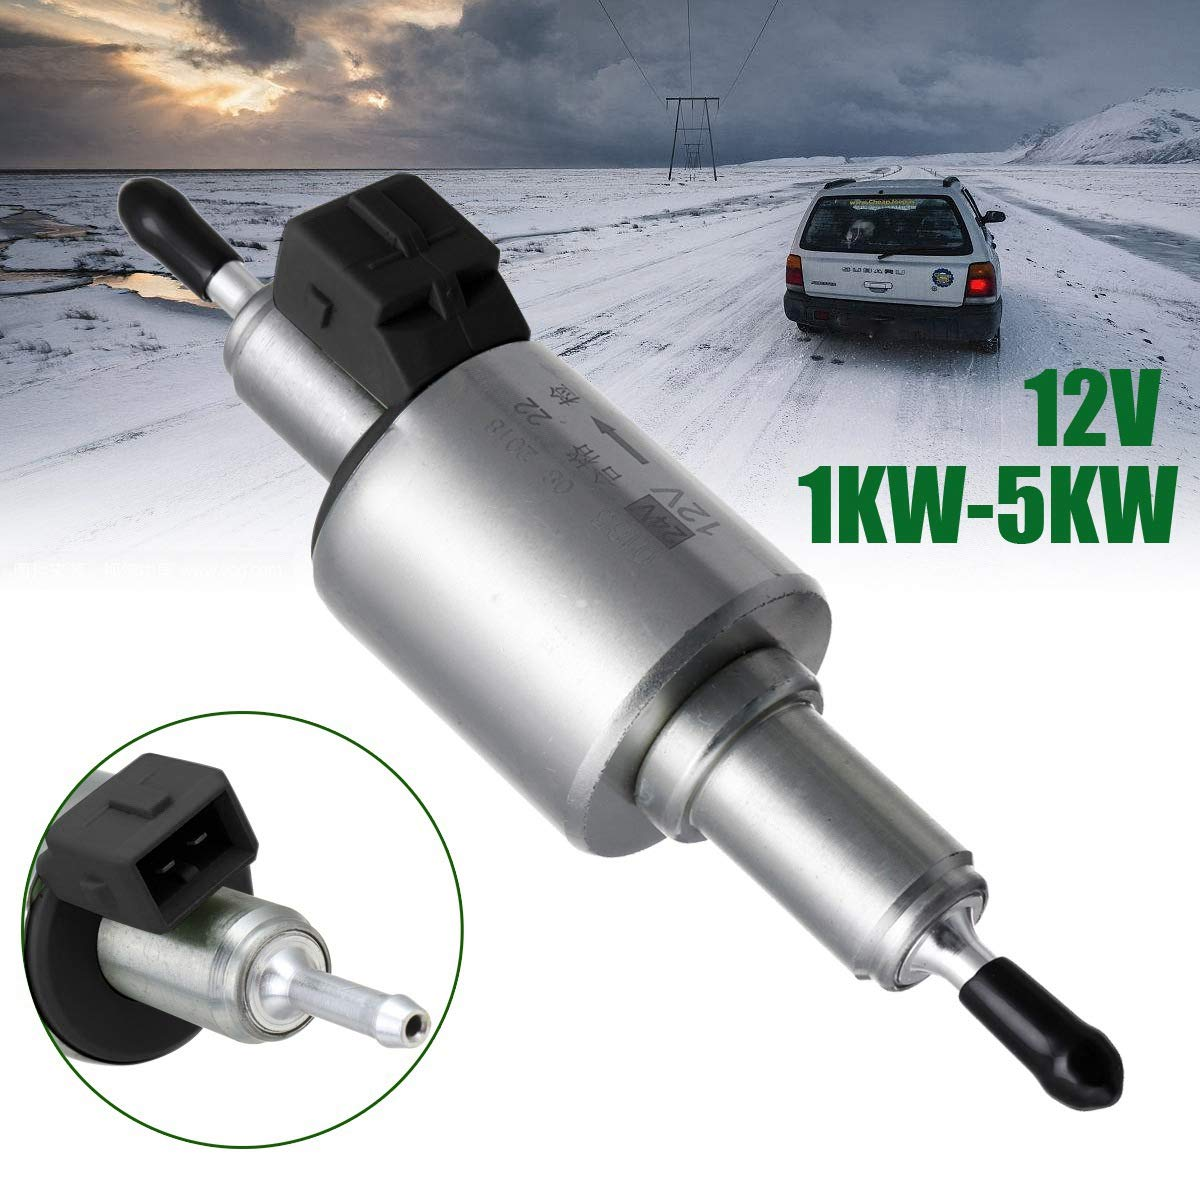 RETYLY Universal 12V 1Kw-5Kw Car Air Heater Diesels Pump For Auto Air Diesels Parking Heater Car Accessories